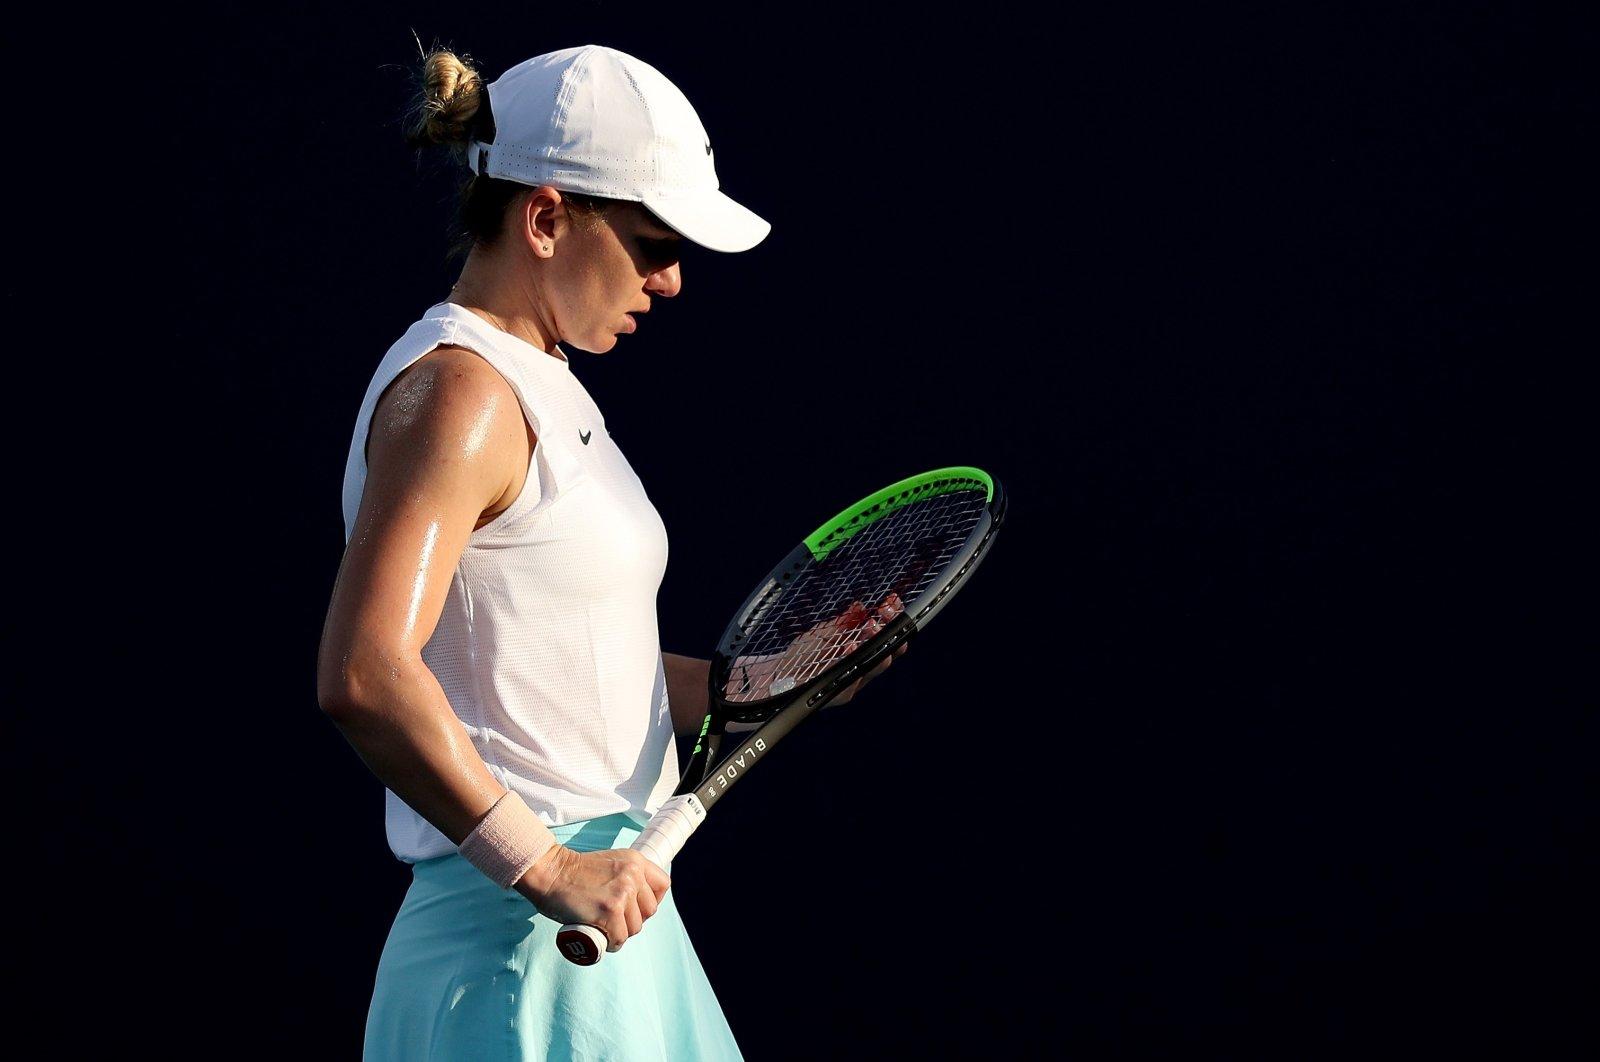 Romania's Simona Halep of Romania during a Miami Open match against France's Caroline Garcia, Miami, Florida, U.S. March 25, 2021. (AFP Photo)